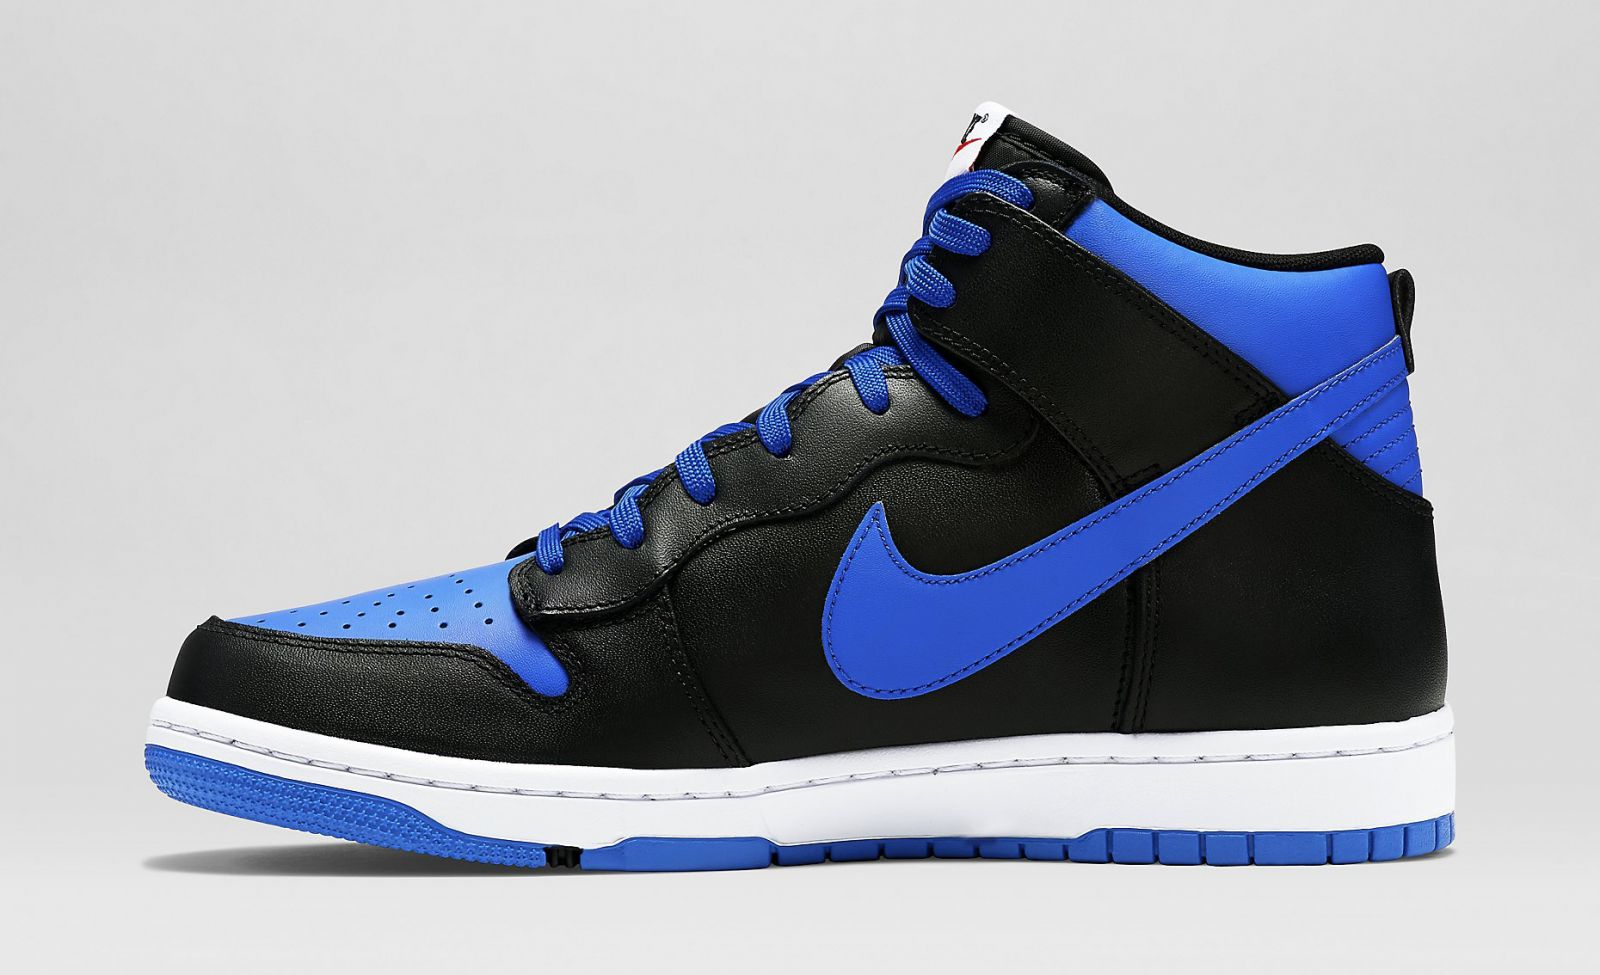 nike shox jermaine o'neal élite - More Nike Dunks That Look Like Air Jordans | Sole Collector